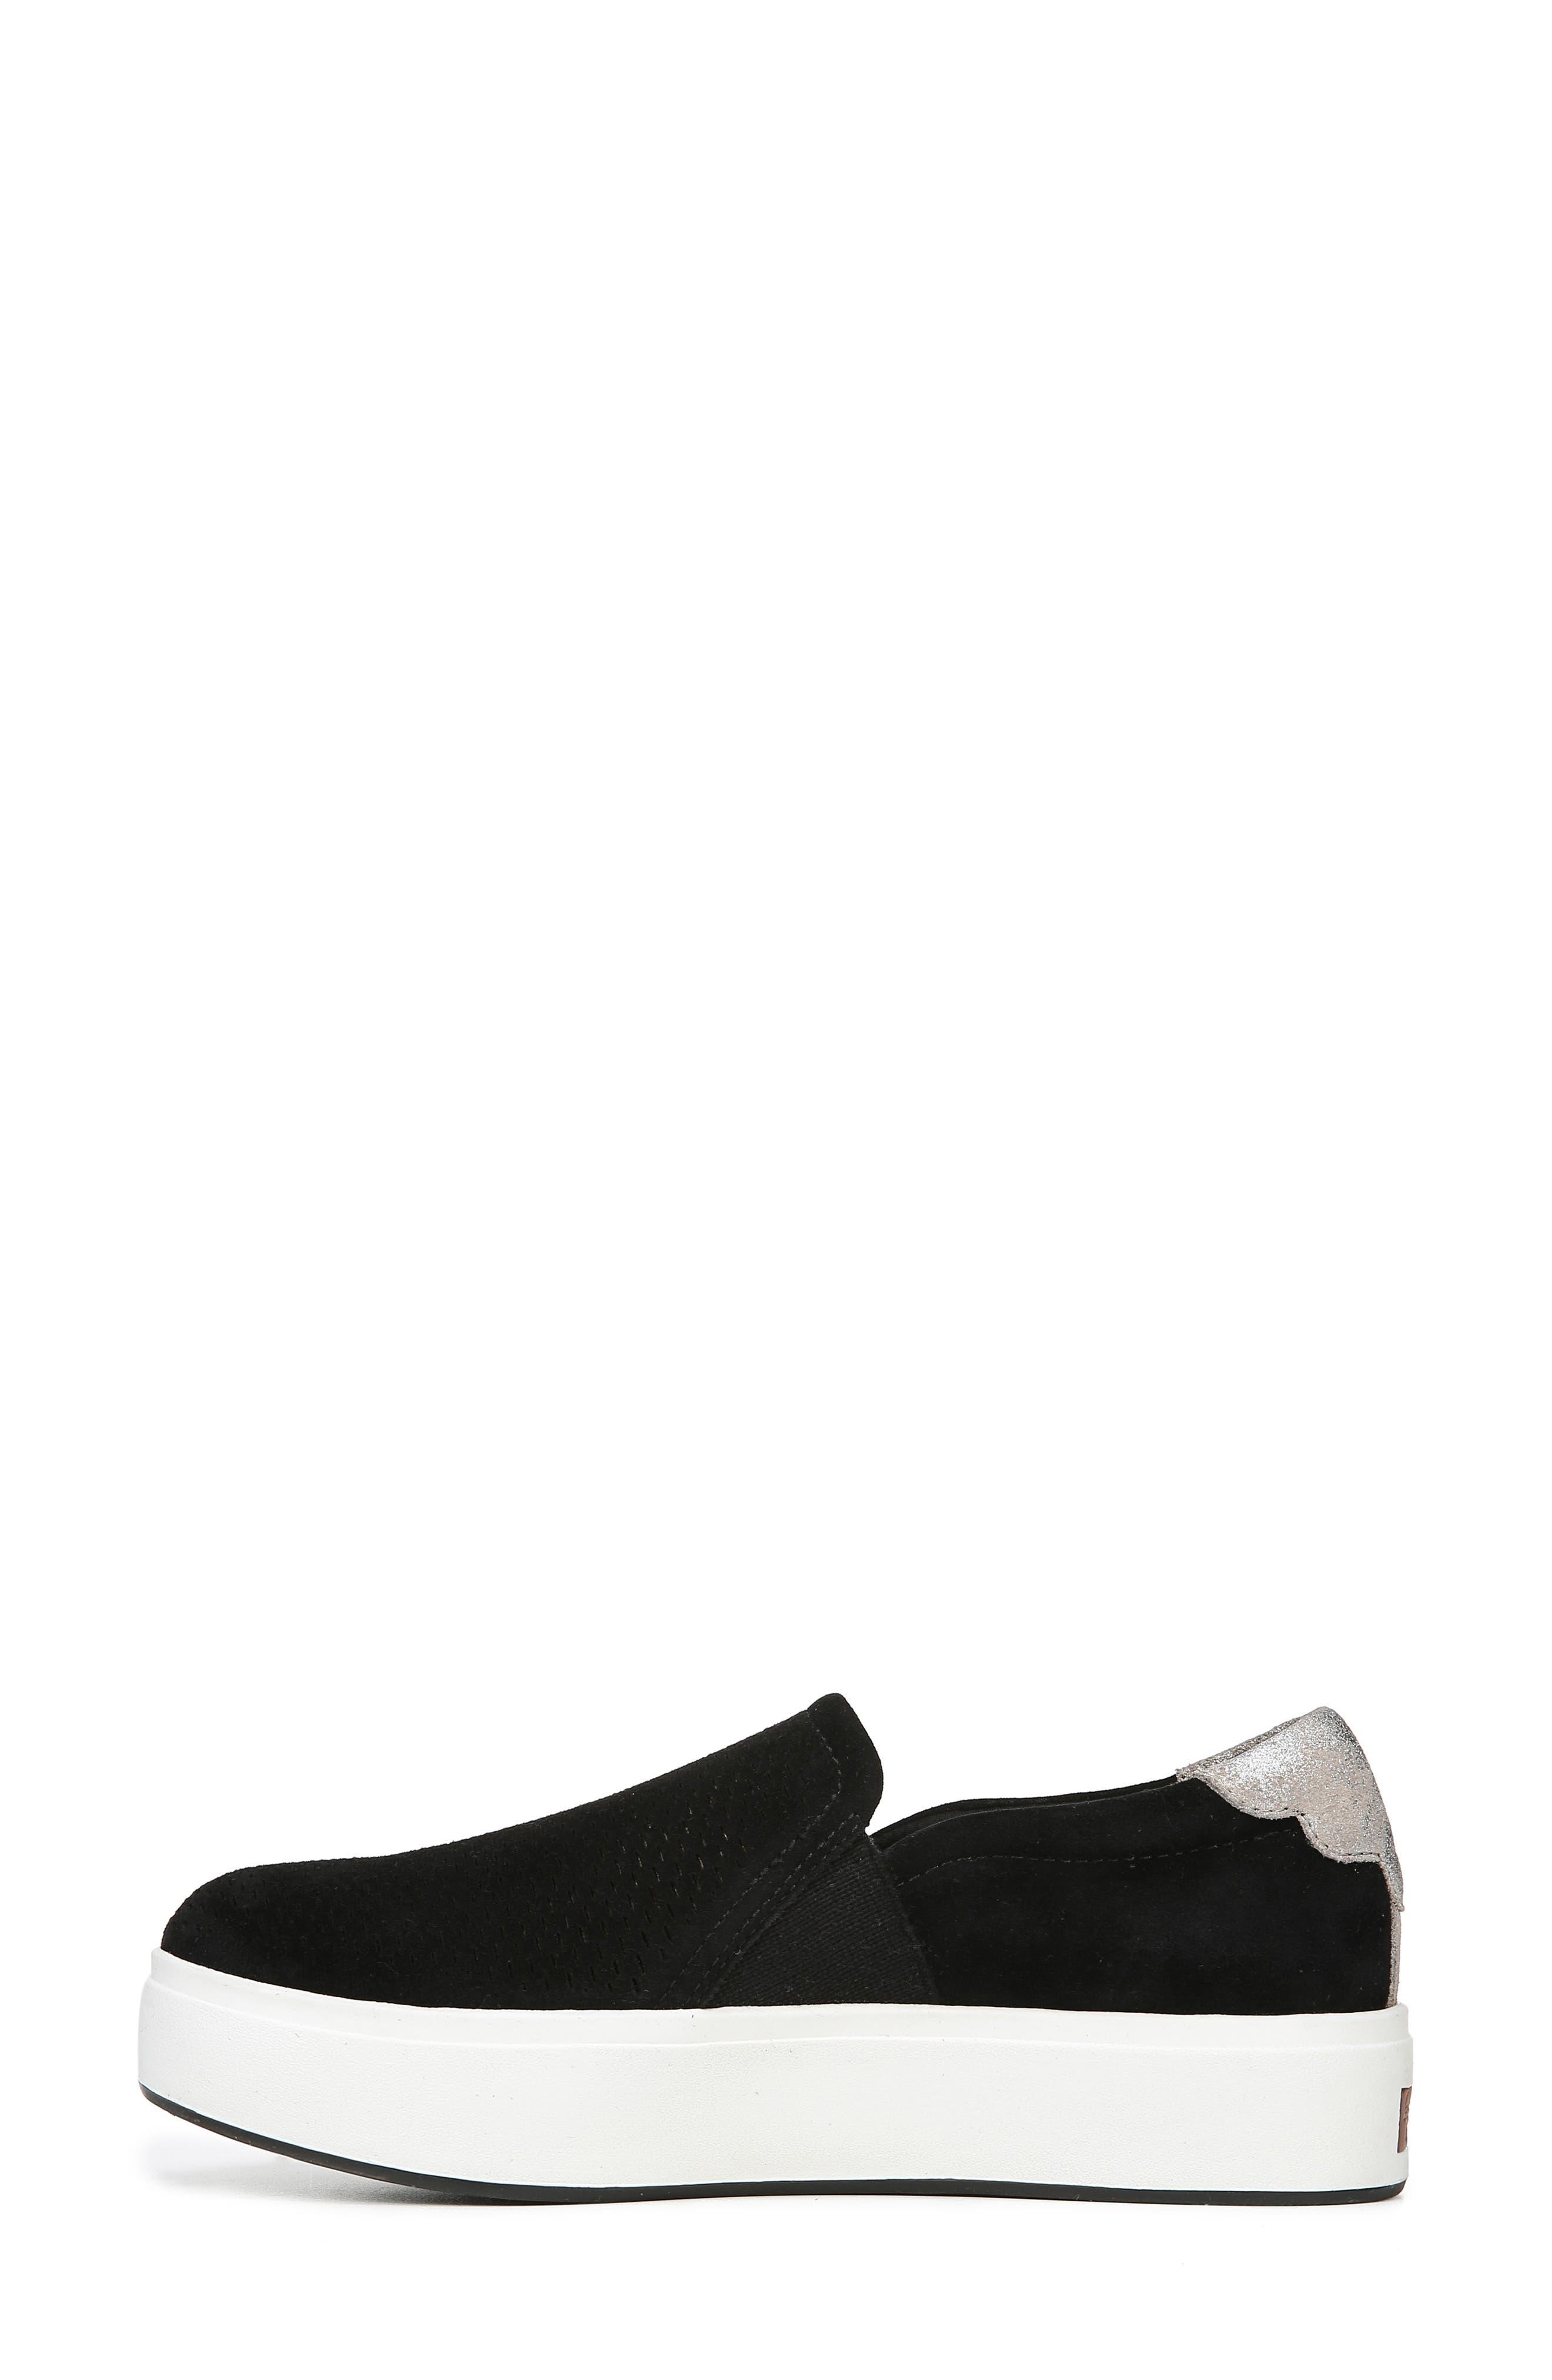 DR. SCHOLL'S, Abbot Lux Sneaker, Alternate thumbnail 8, color, BLACK SUEDE